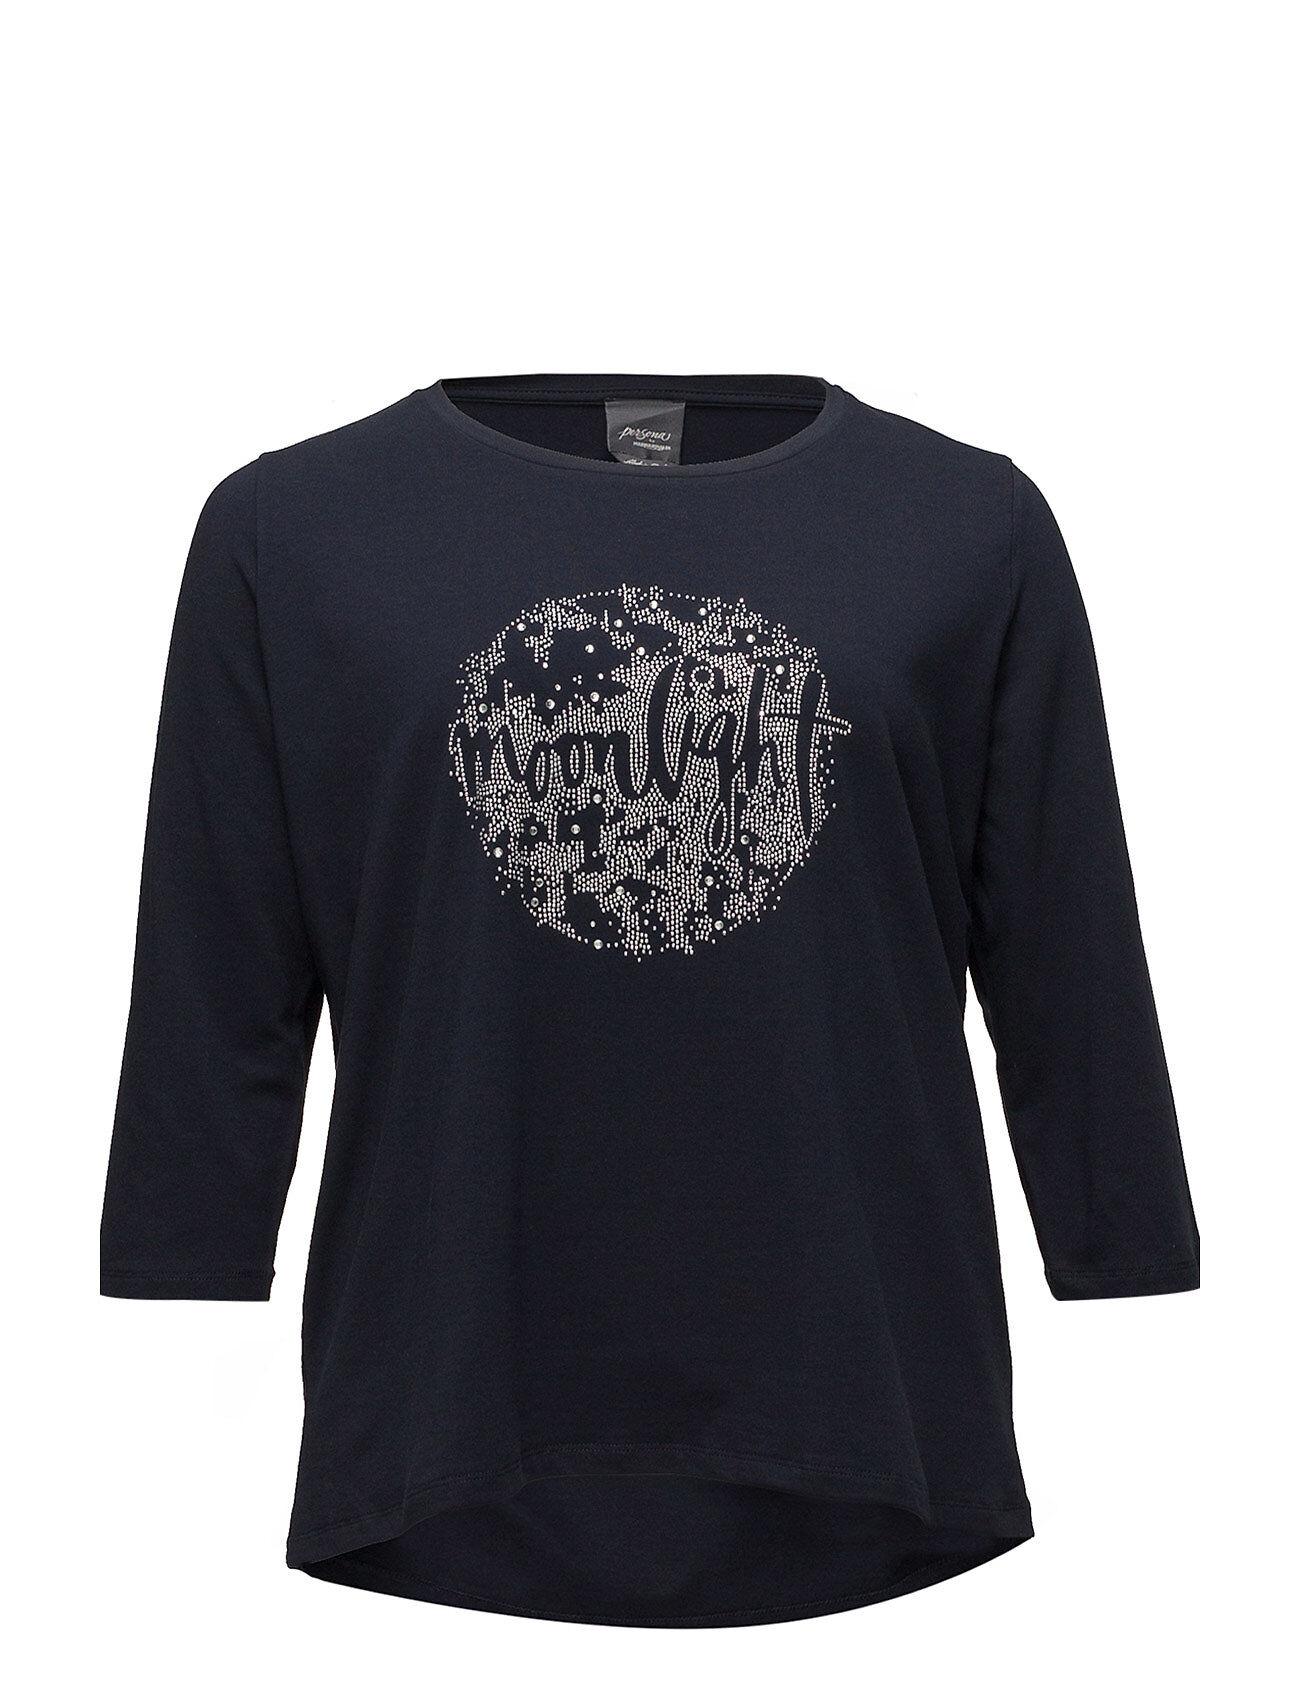 Persona by Marina Rinaldi Vaso T-shirts & Tops Long-sleeved Sininen Persona By Marina Rinaldi